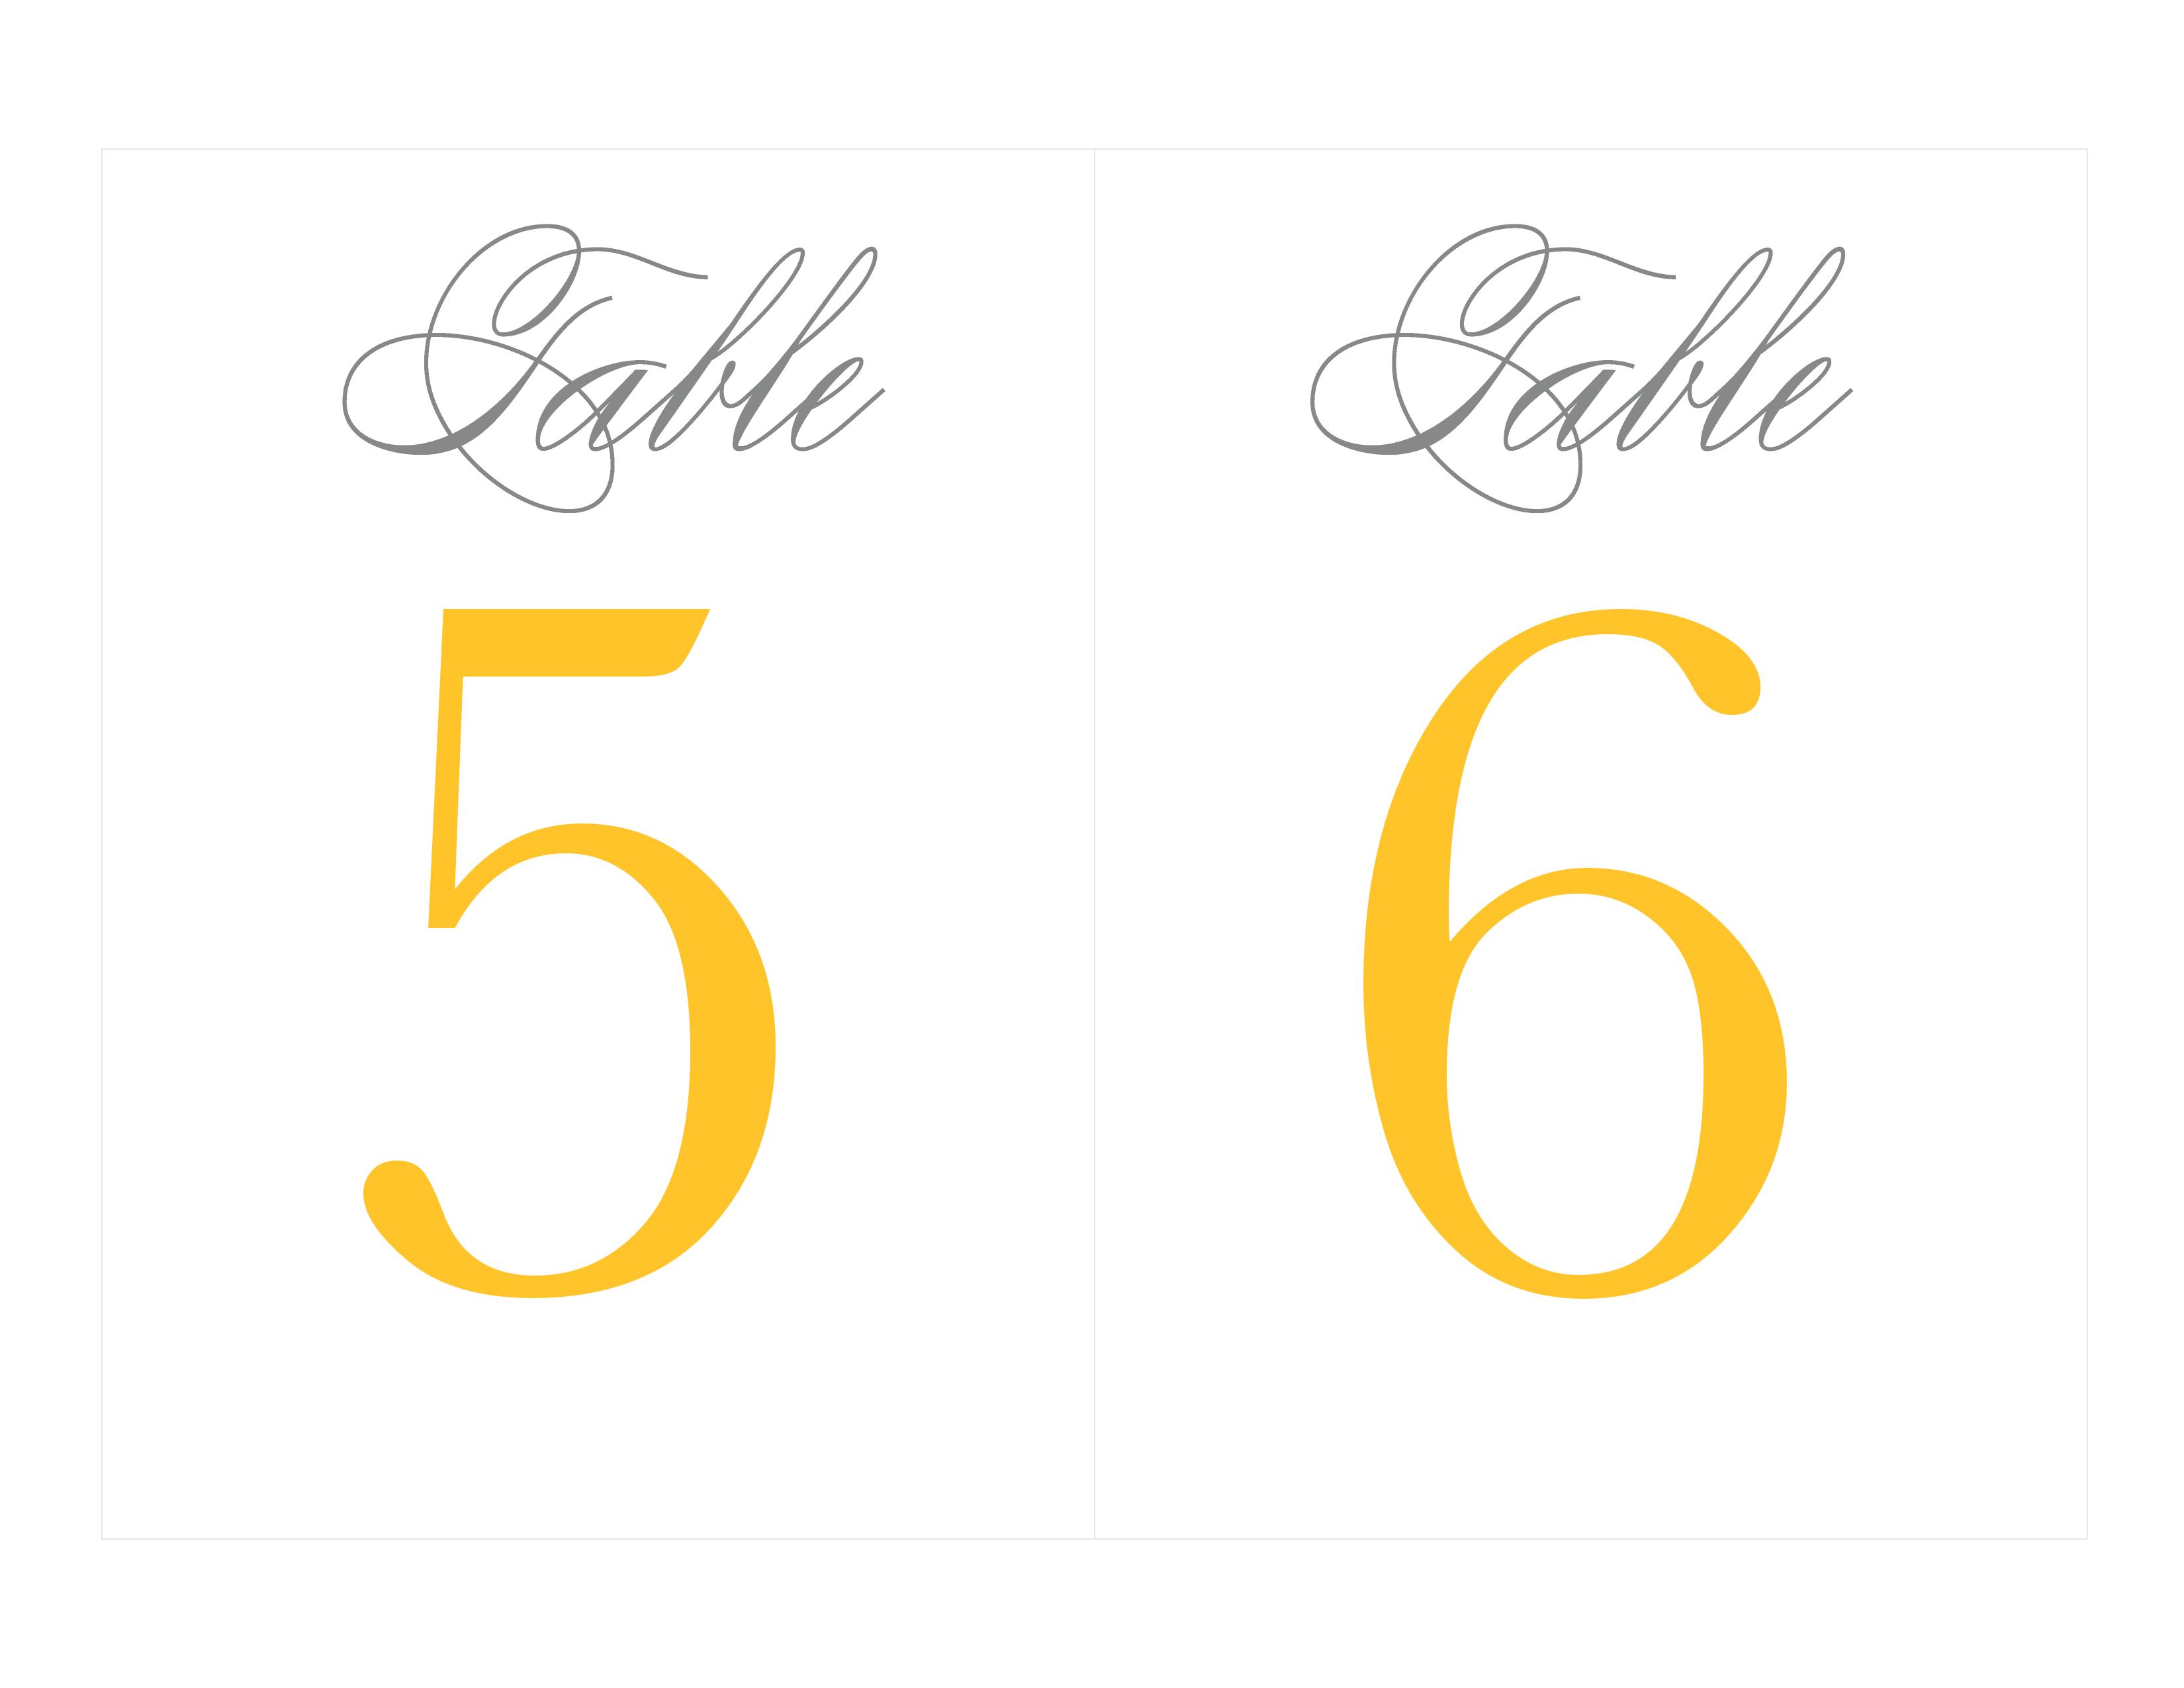 Free Printable Table Numbers | Wedding Ideas - Grey & Yellow - Free Printable Table Numbers 1 20